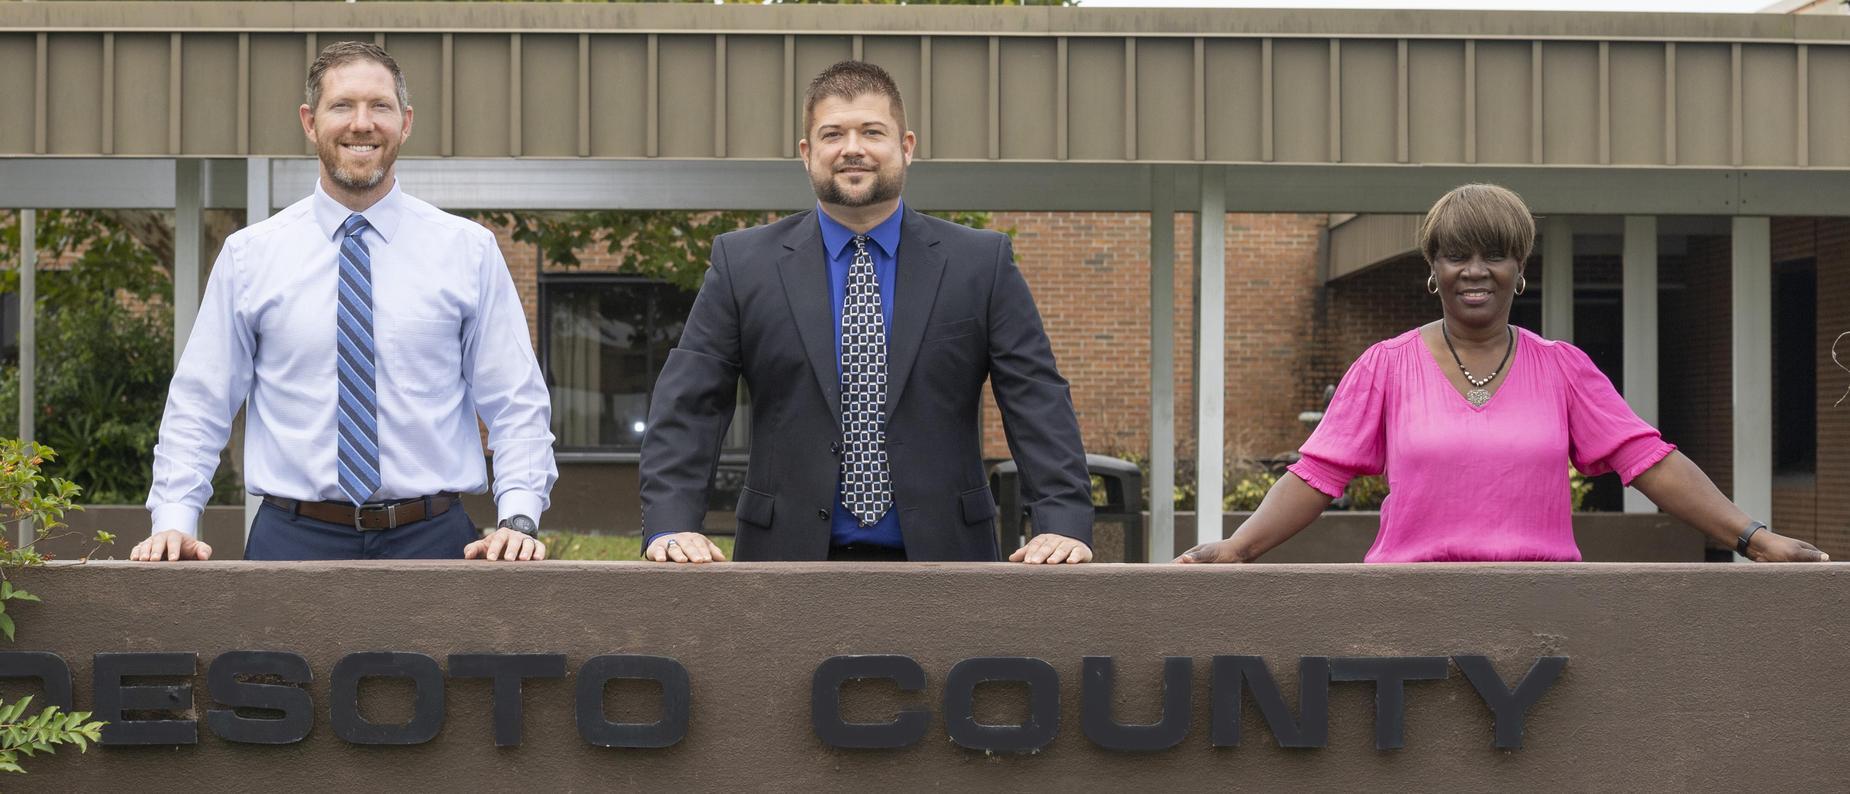 DeSoto High School Administrators